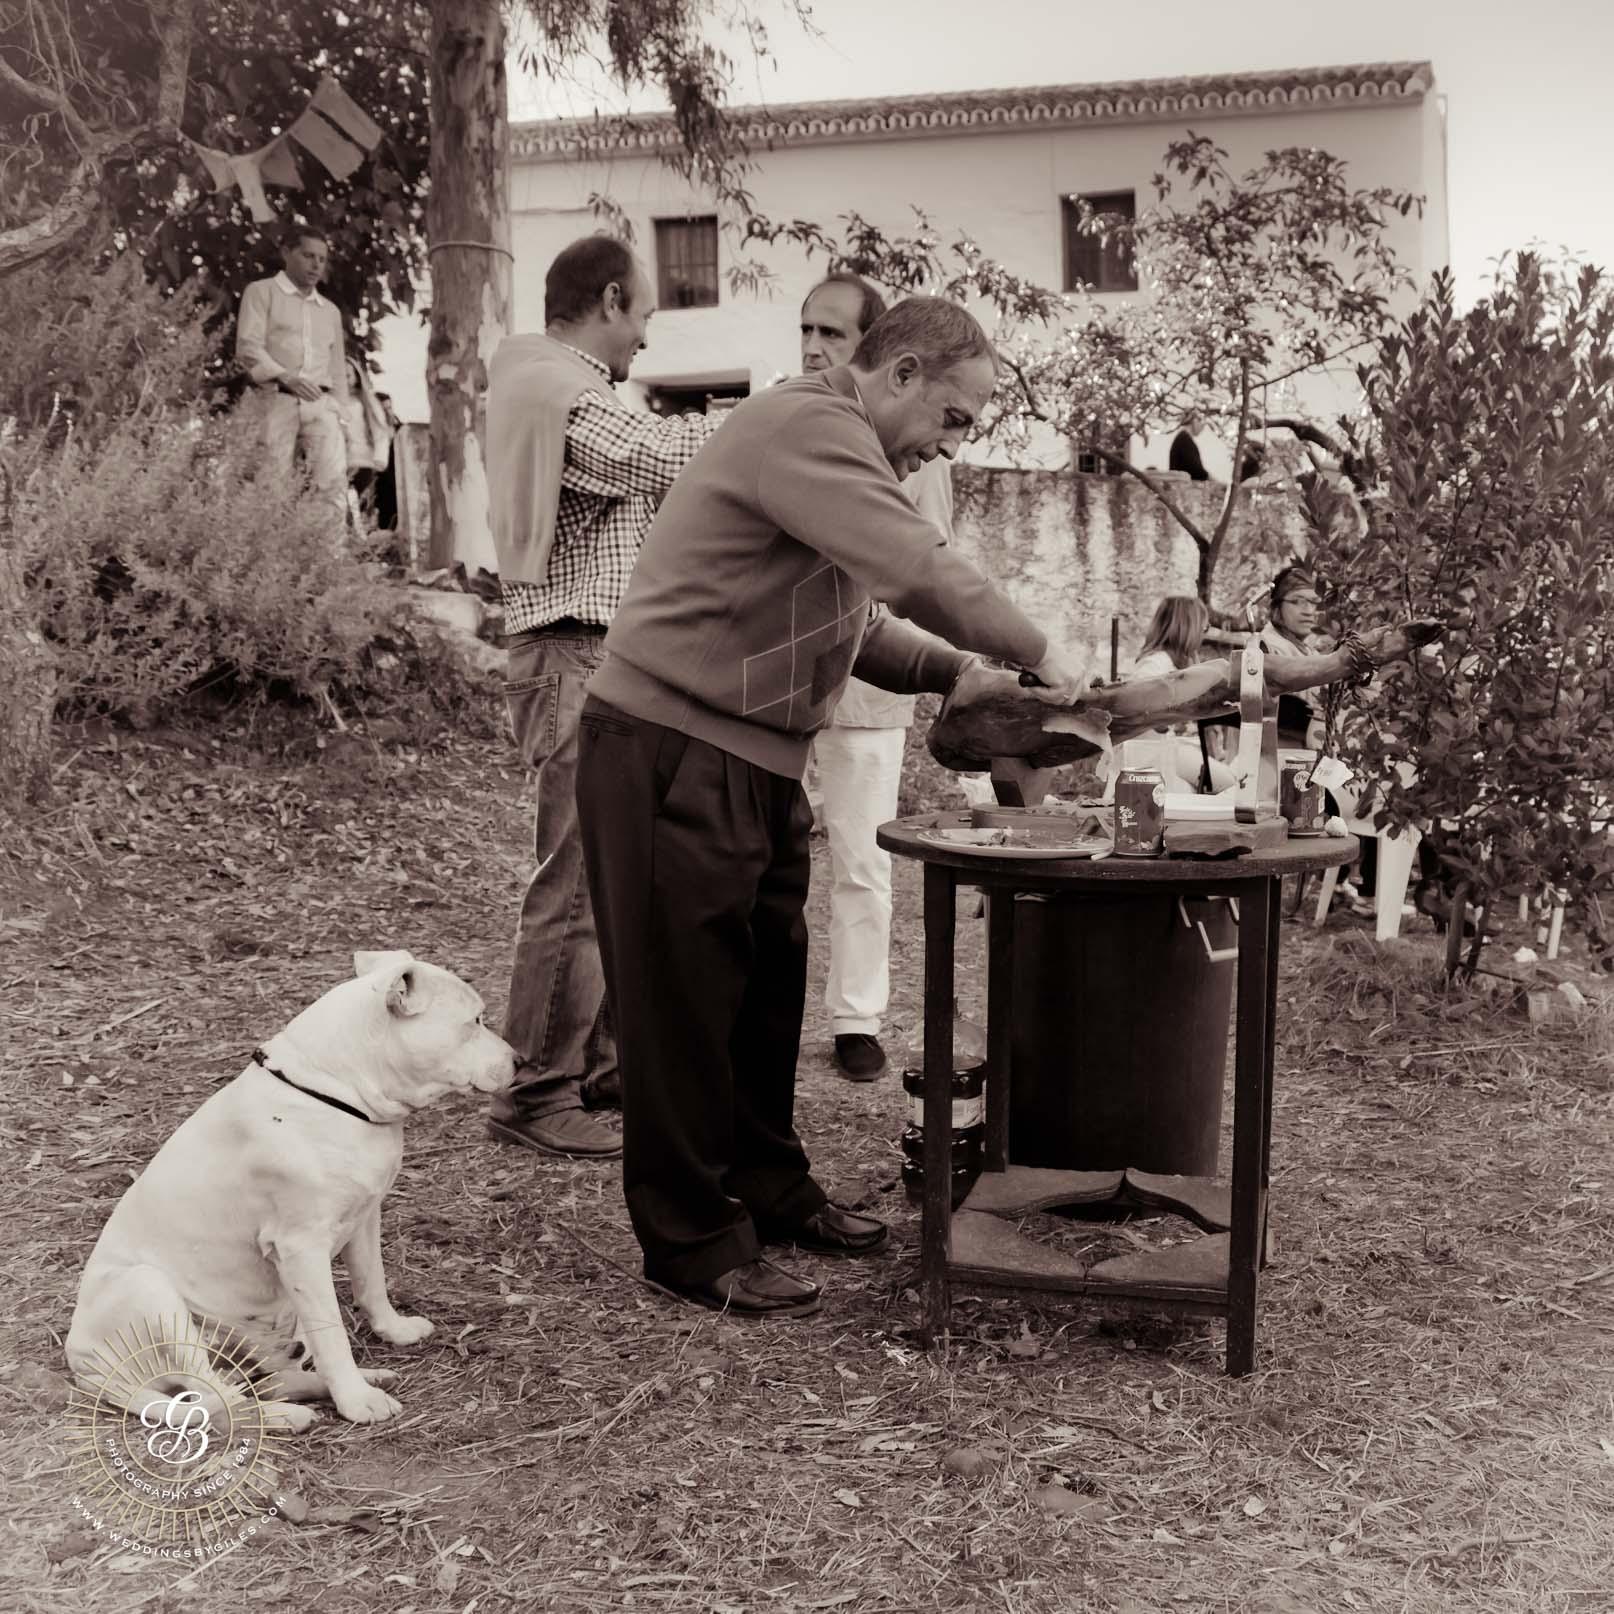 dog watches the Jamon Iberico